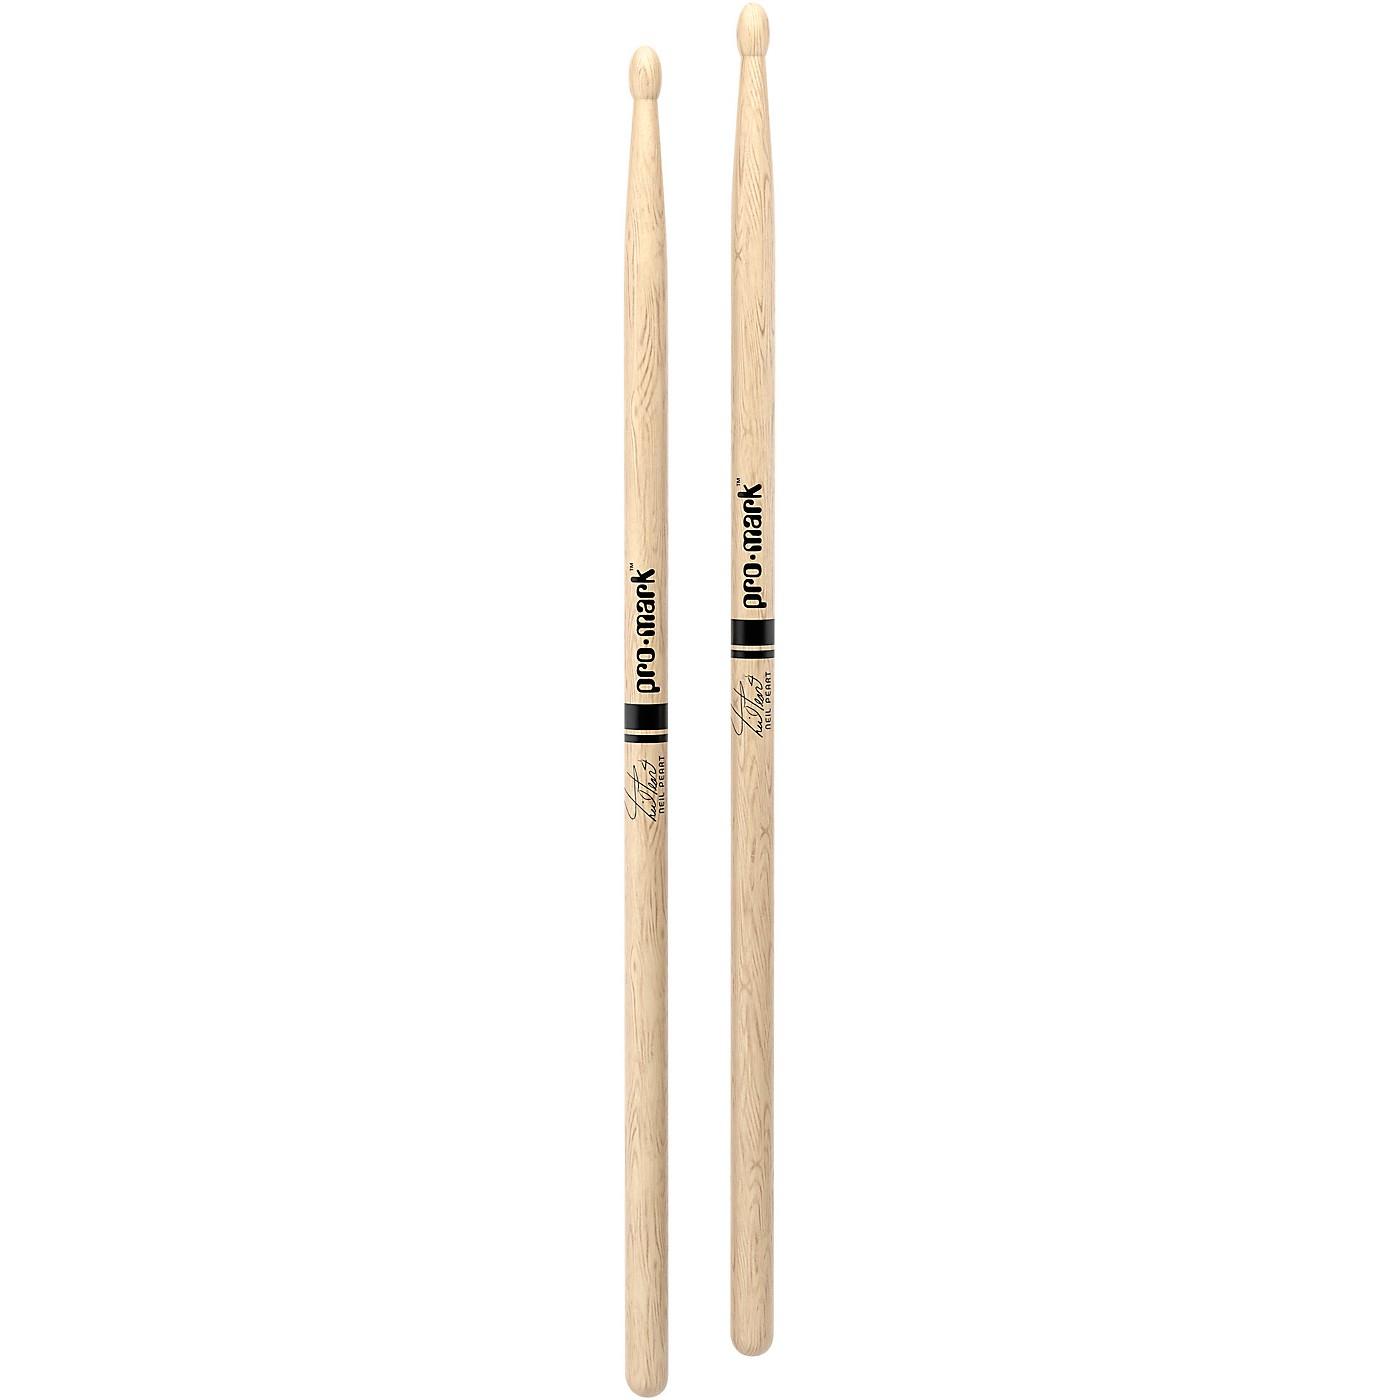 Promark Neil Peart Autograph Series Drumsticks thumbnail